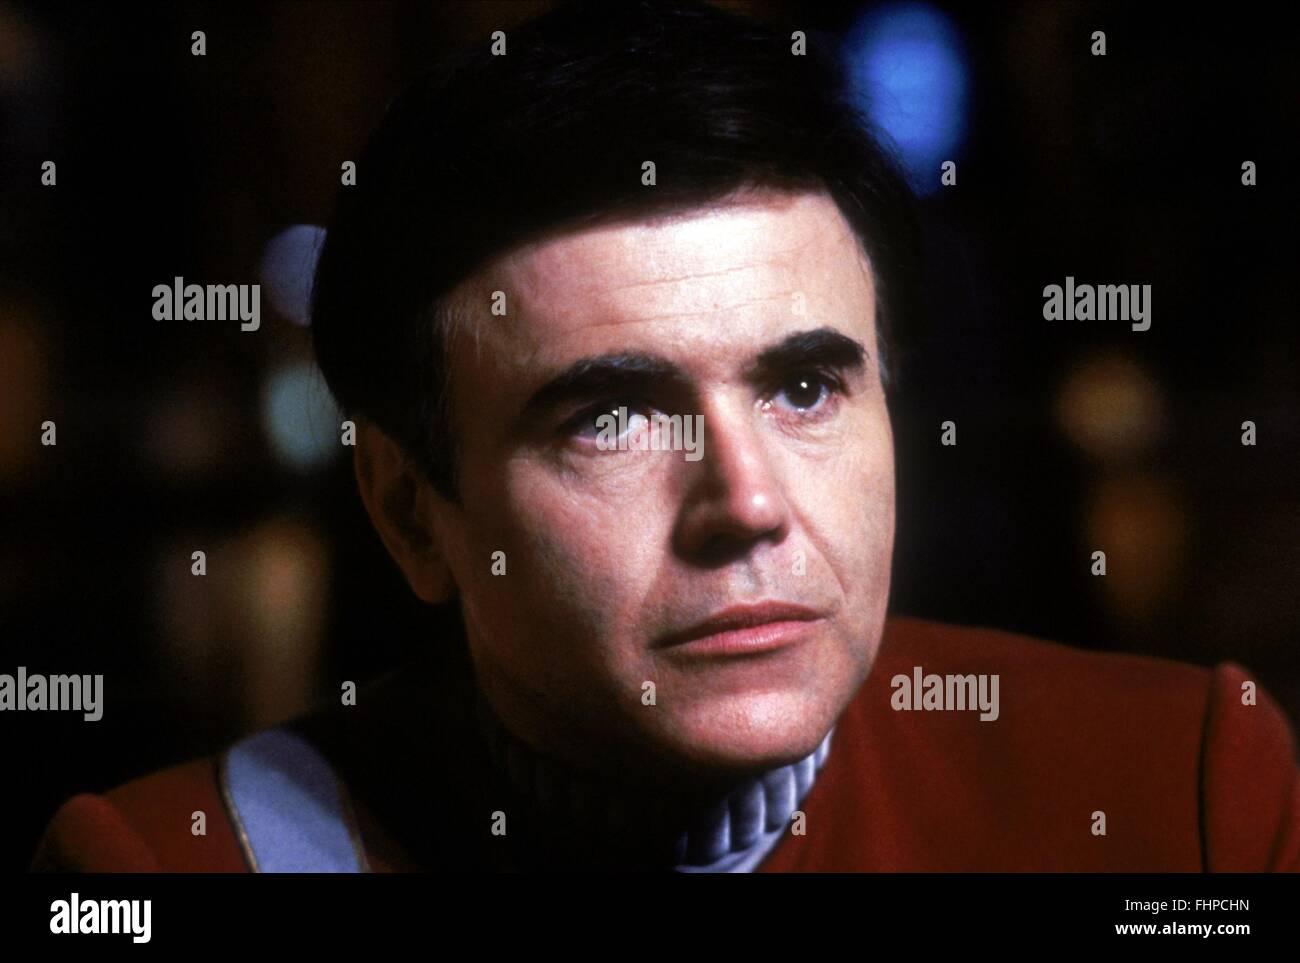 WALTER KOENIG STAR TREK V: THE FINAL FRONTIER (1989) - Stock Image